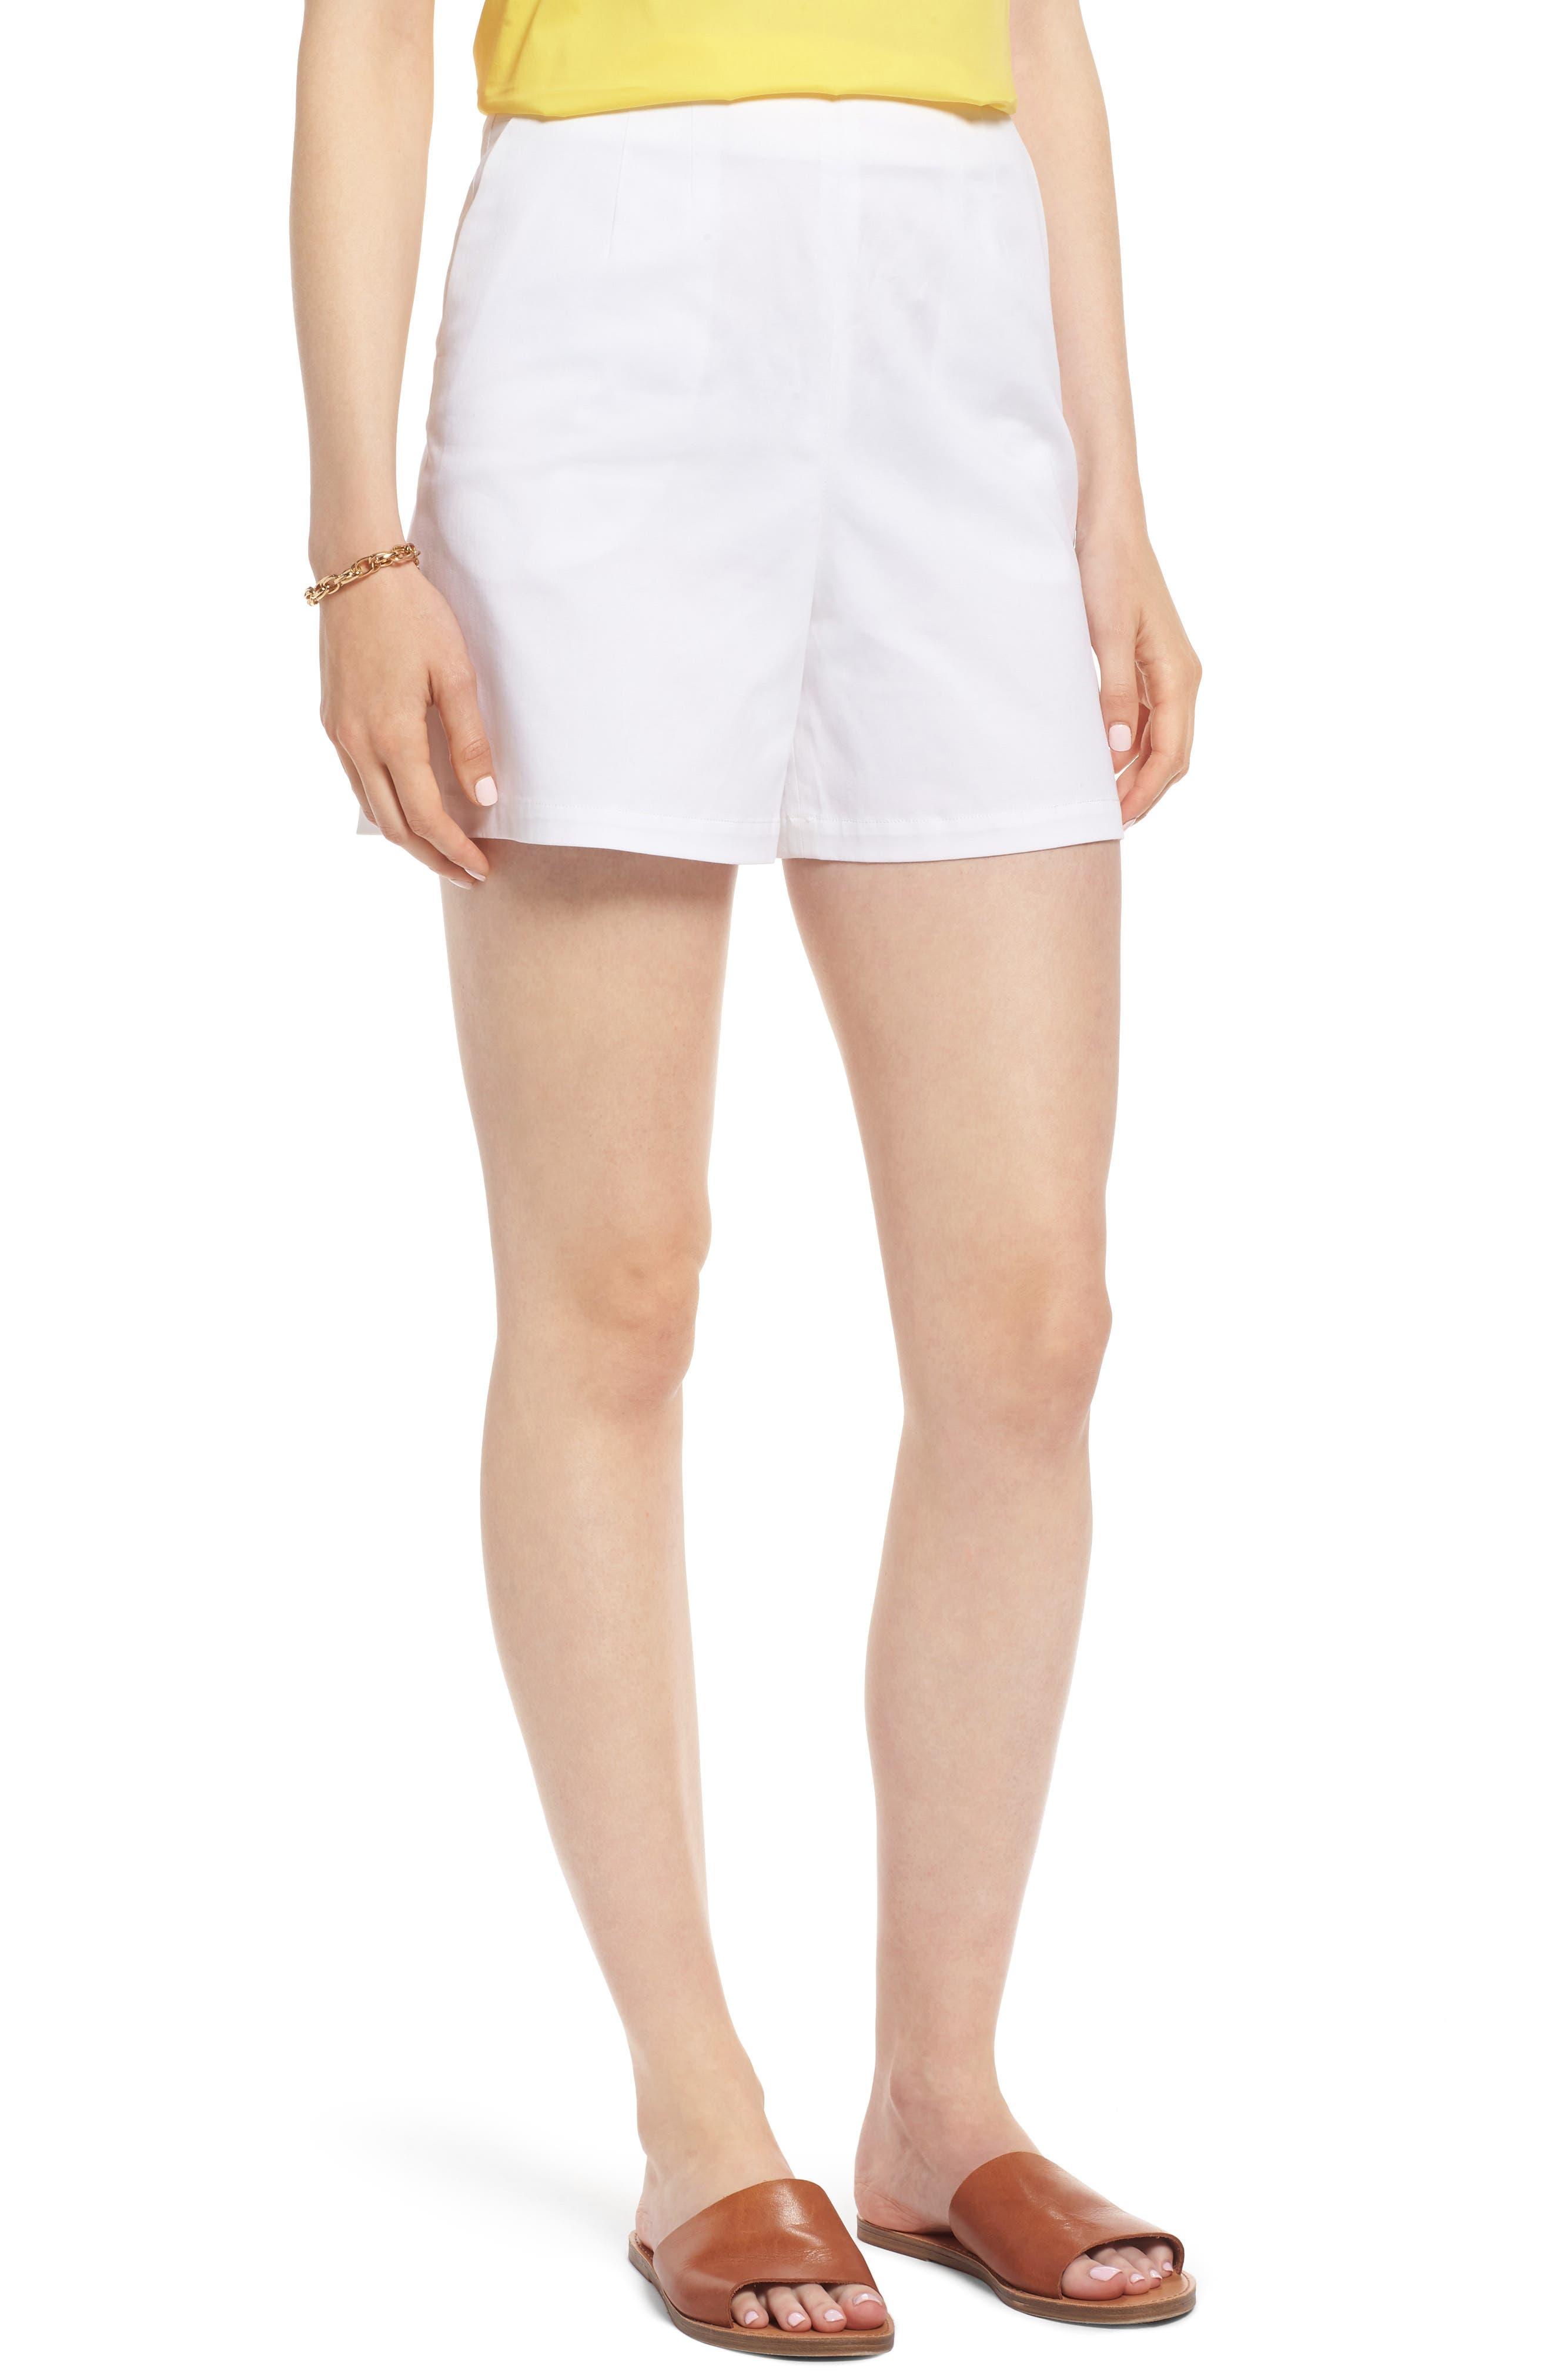 Clean Twill Shorts,                             Main thumbnail 1, color,                             White